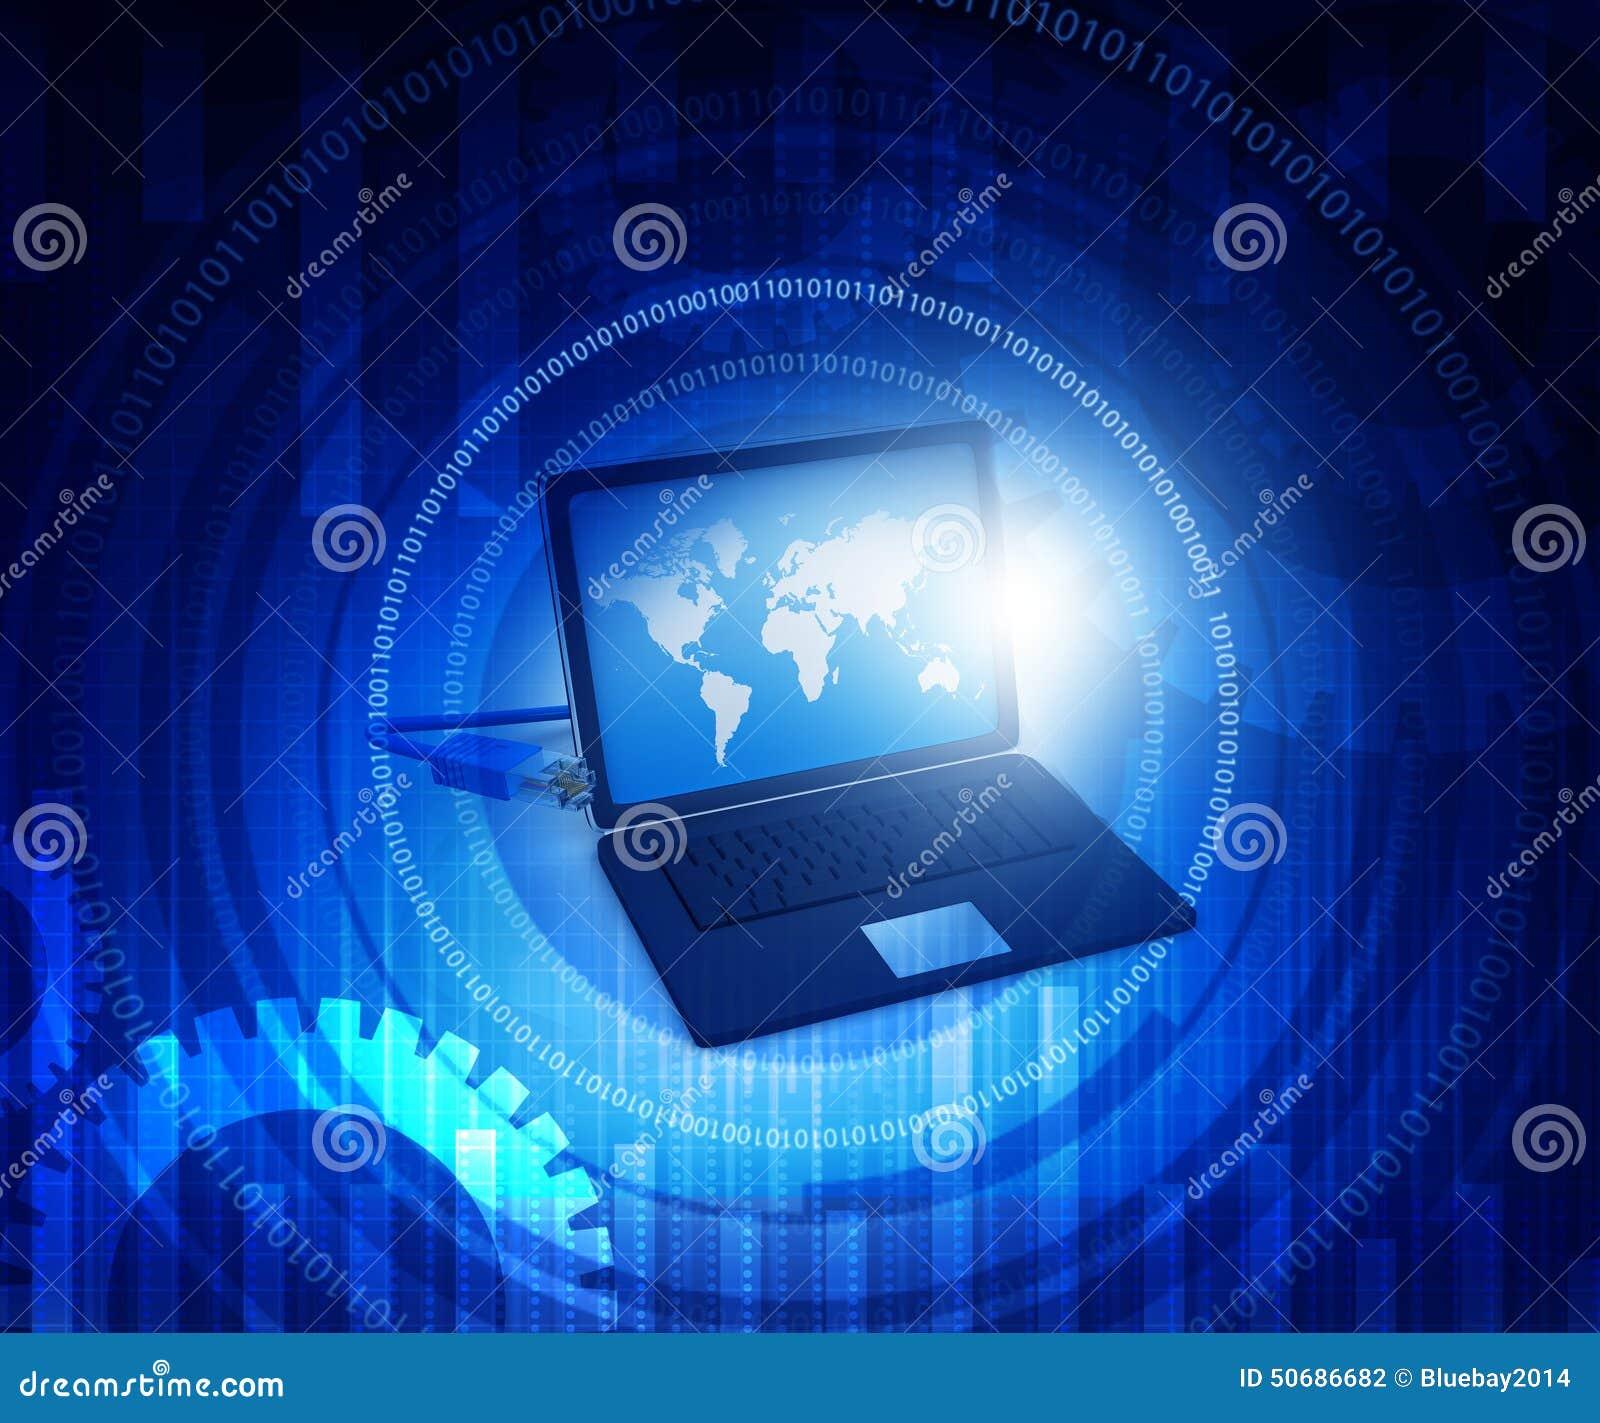 Download 计算机膝上型计算机 库存例证. 插画 包括有 技术, 未来派, 网络, 虚构, 数字, 空间, 商业, 膝上型计算机 - 50686682